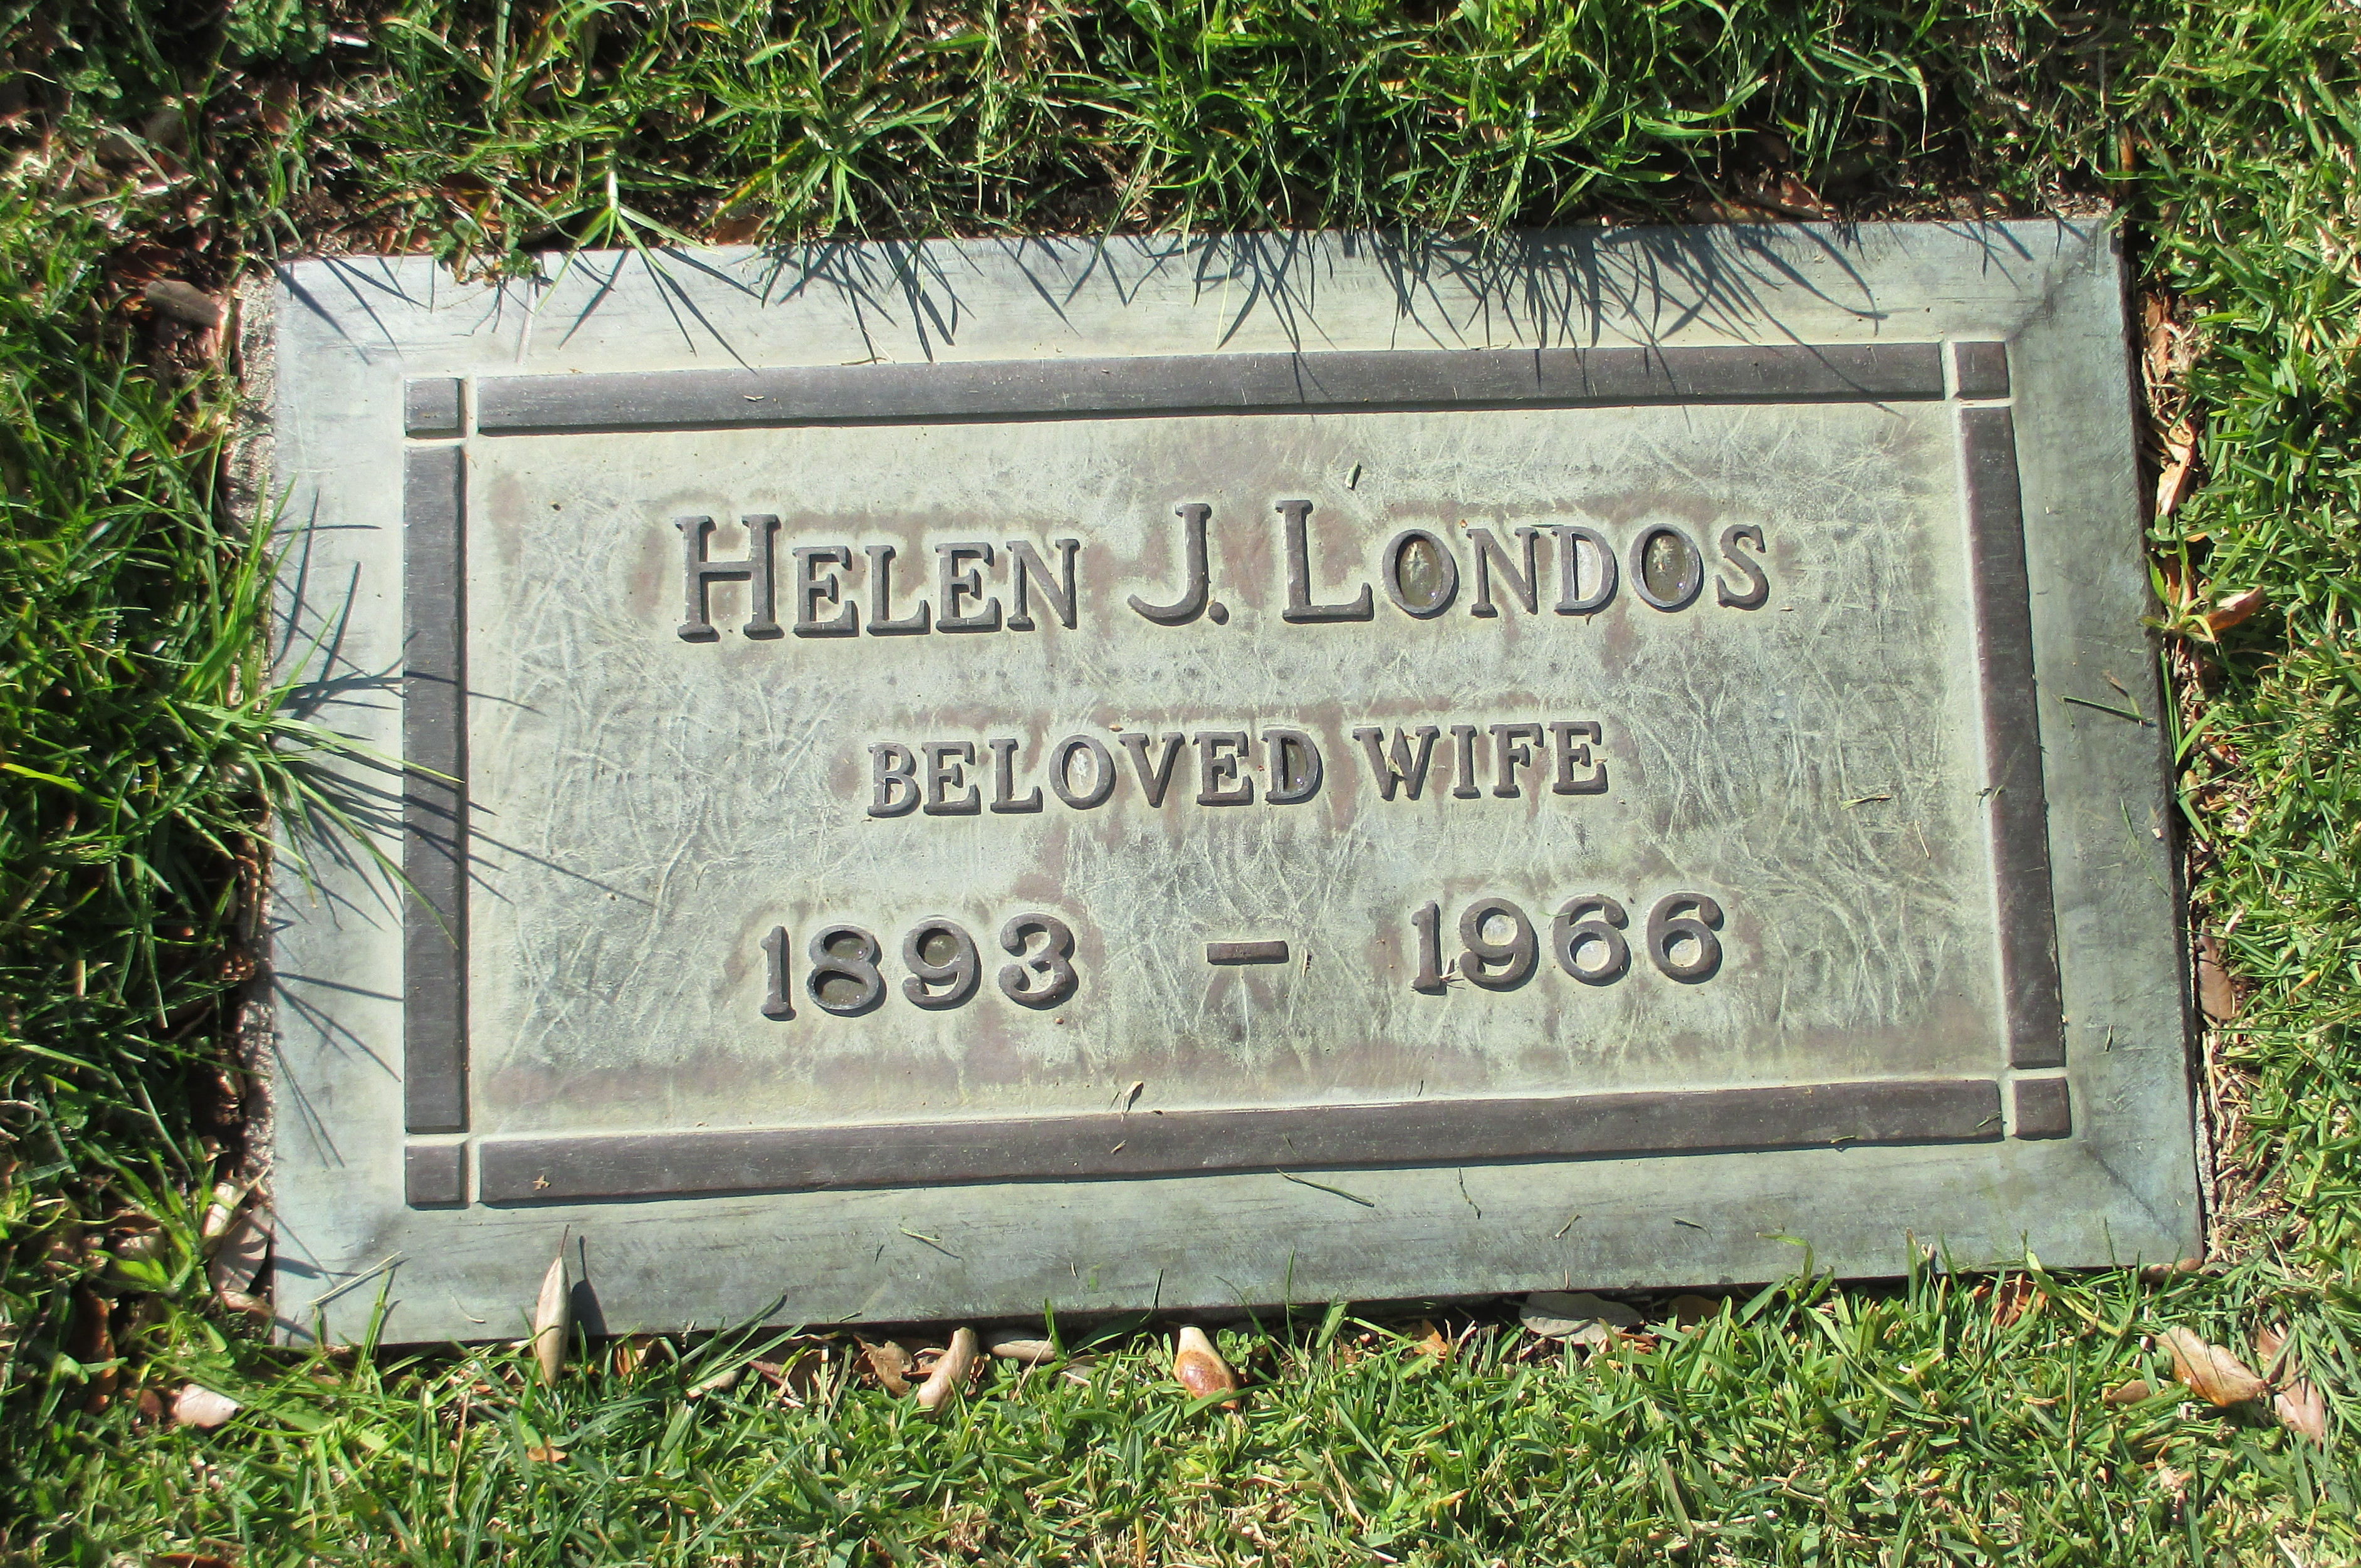 Helen J Londos